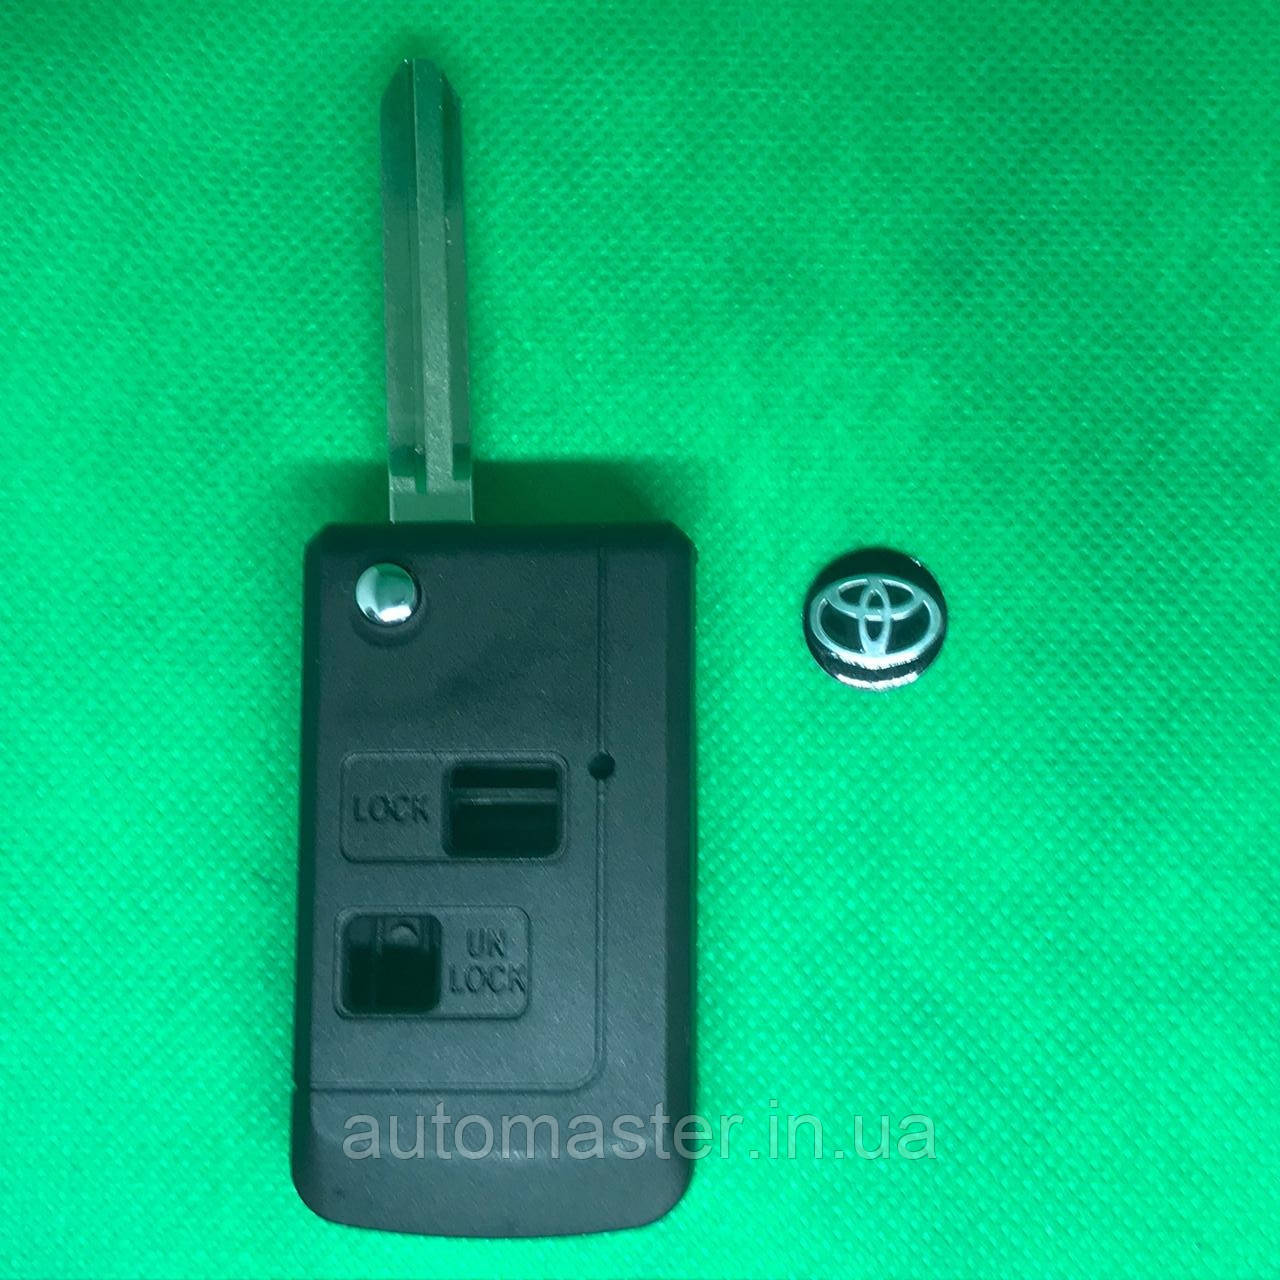 Корпус автоключа TOYOTA Prado, Corolla, Rav 4 (Тойота Прадо, Корола, Рав 4) 2 - кнопки, лезо TOY43